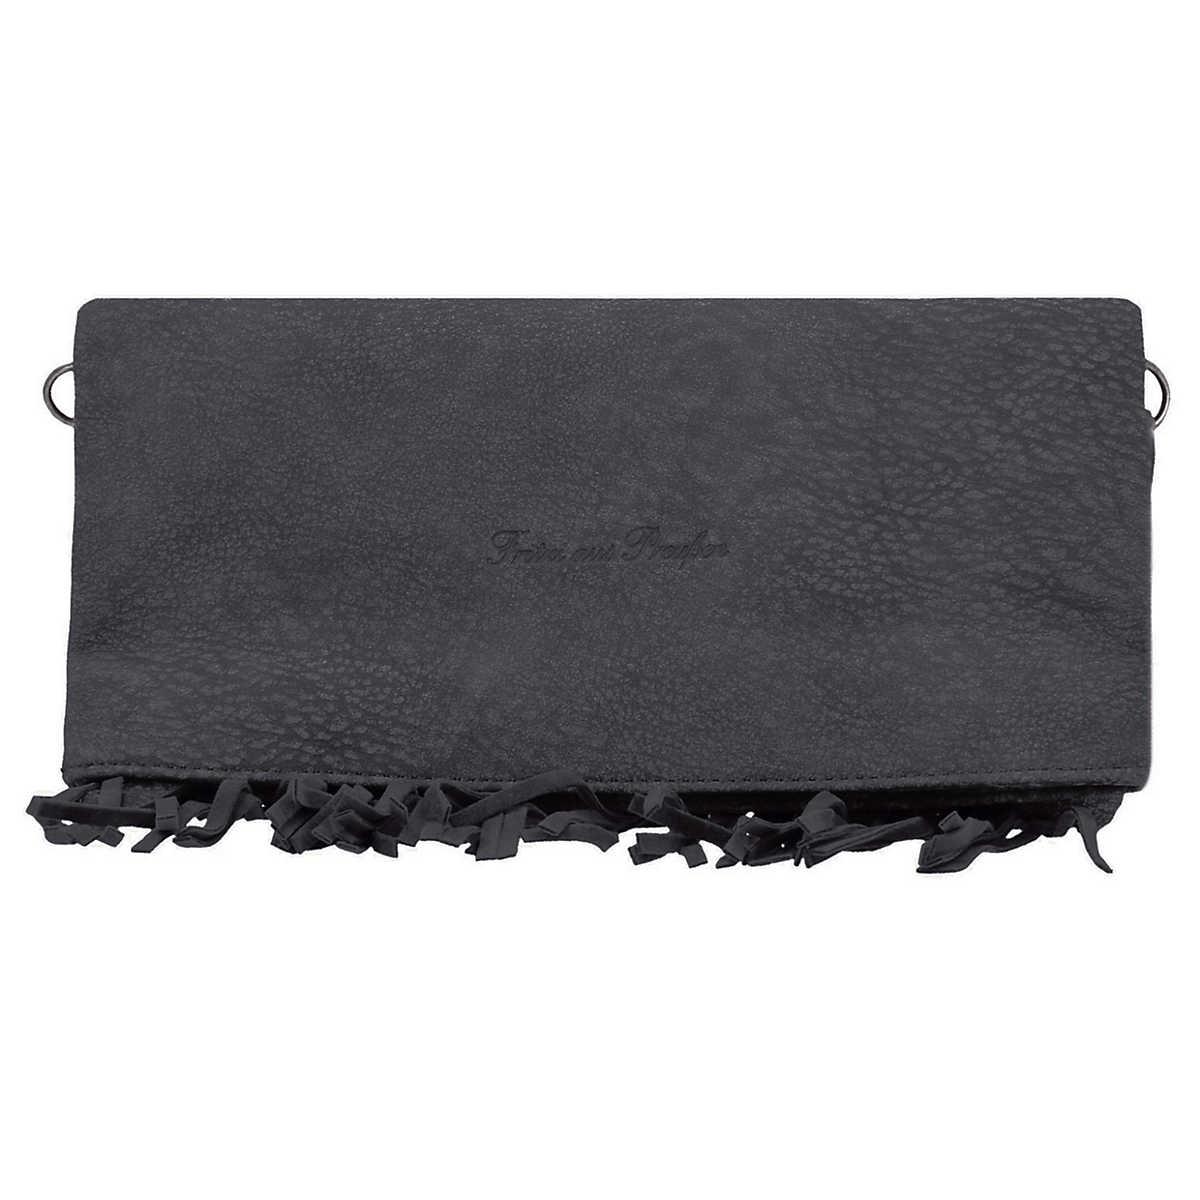 Ronja Fringe Kuba Clutch Tasche 29 cm schwarz - Fritzi aus PreuÃ?Â?en - Clutch & Abendtaschen - Taschen - mirapodo.de